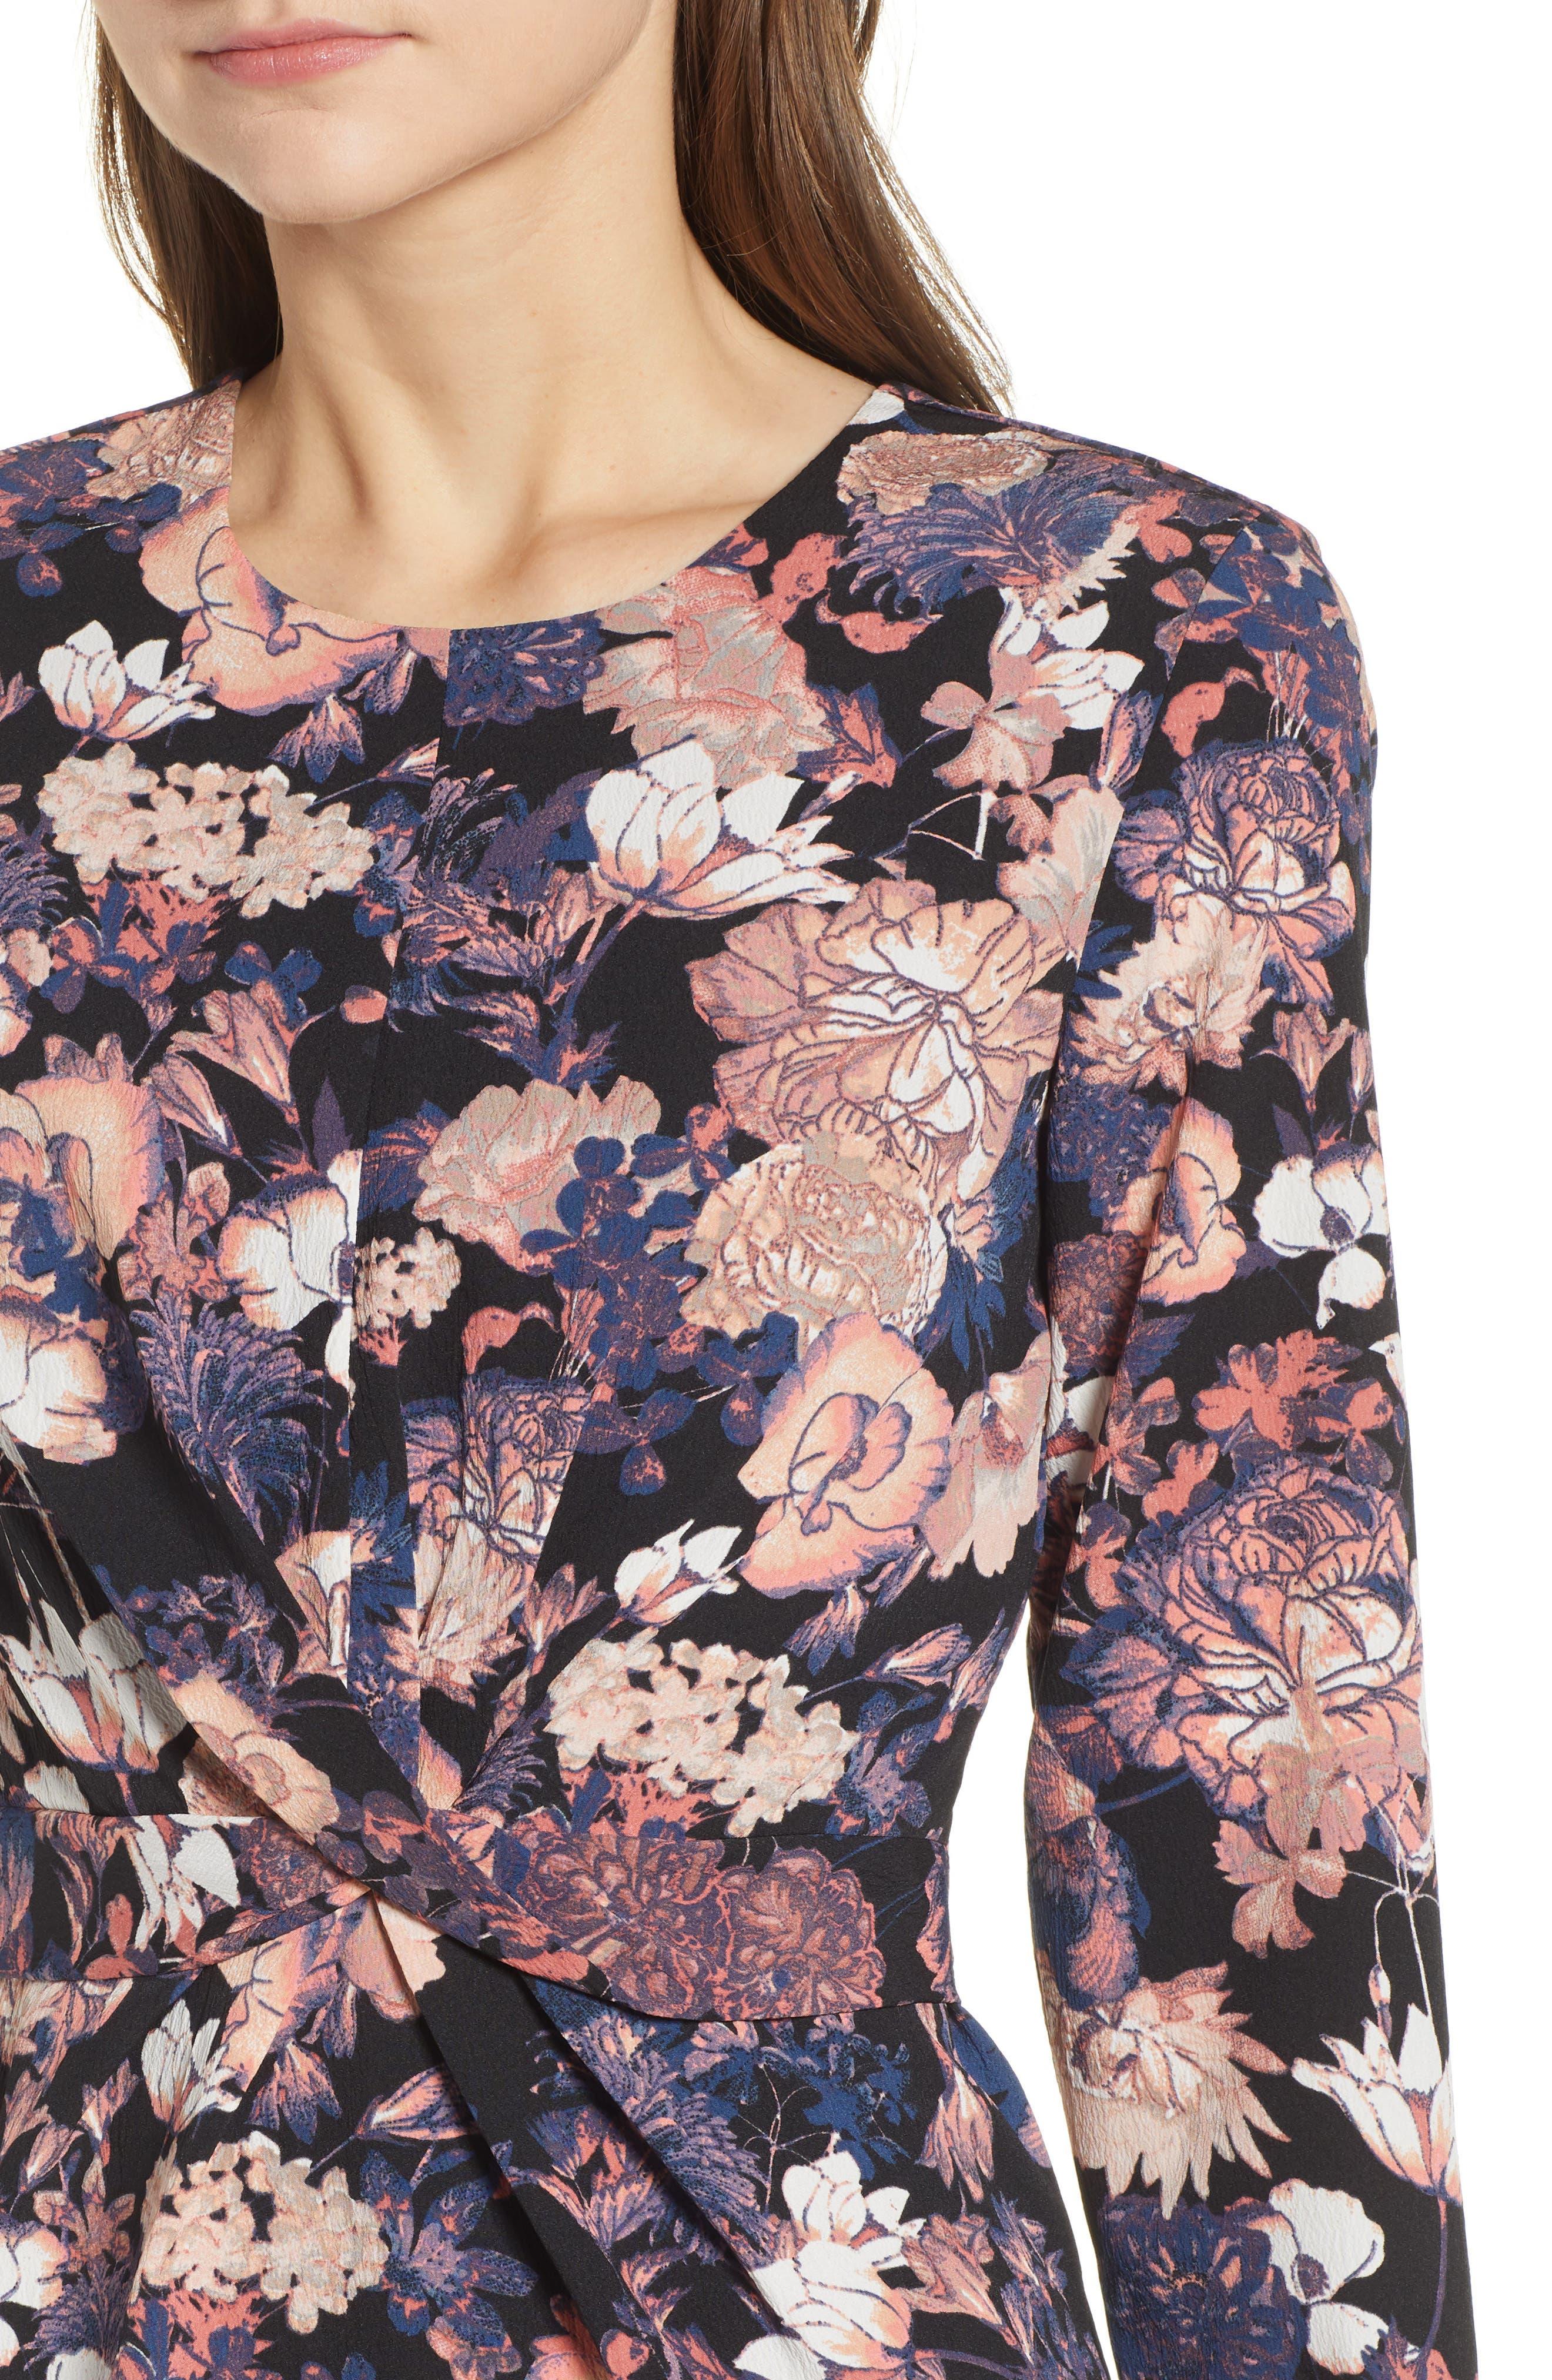 VERO MODA,                             Marlene Floral Drape Dress,                             Alternate thumbnail 5, color,                             BLACK PRINT